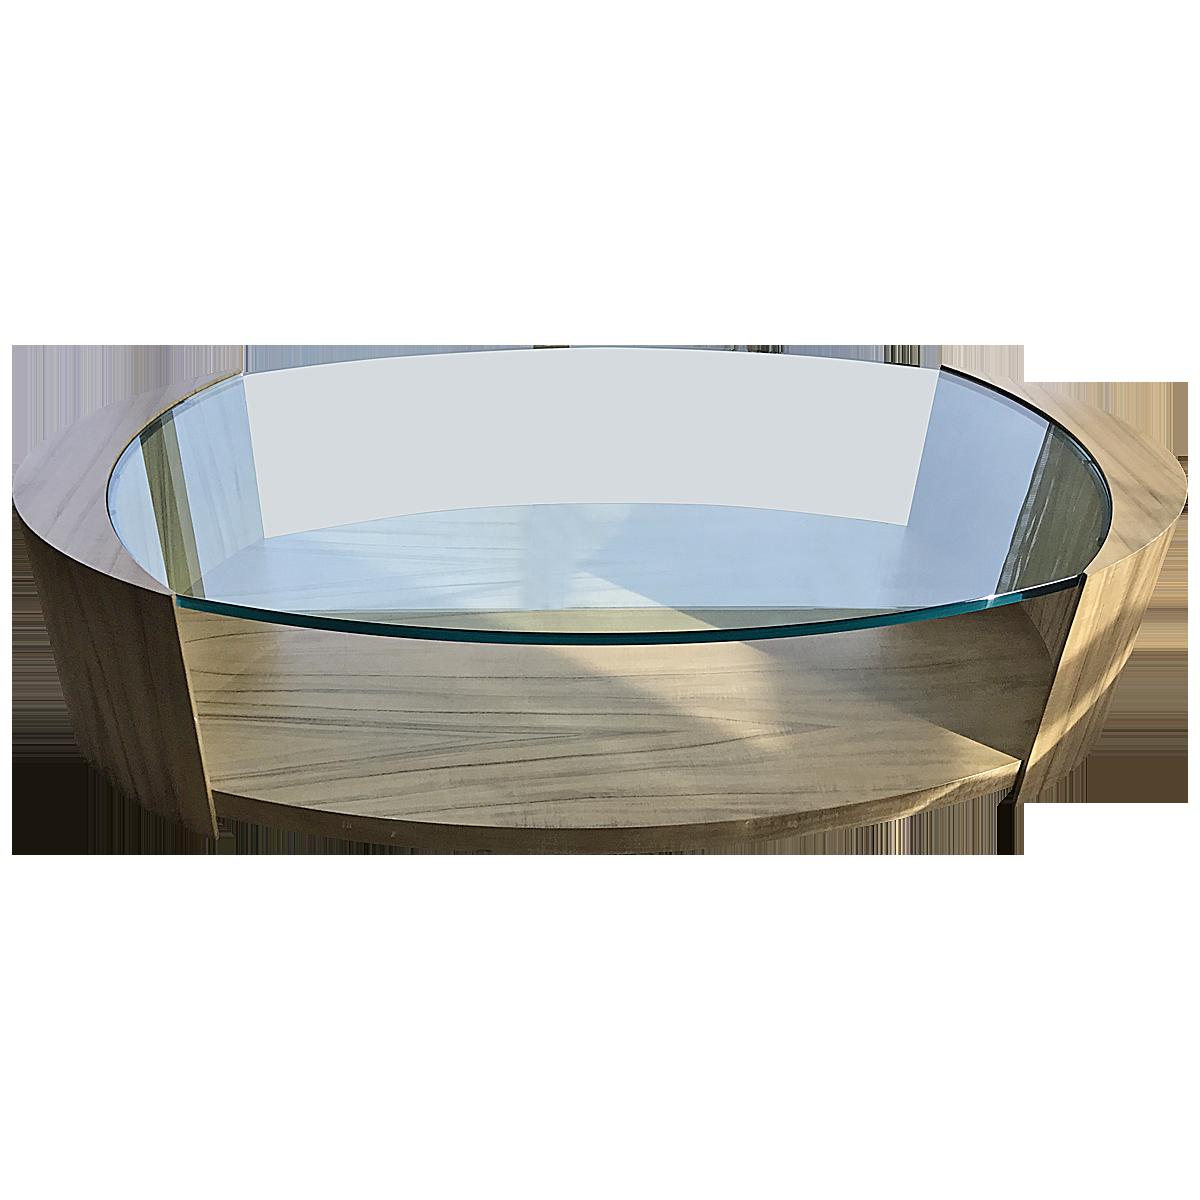 Oval Wood And Glass Coffee Table Glass Coffee Table Coffee Table Table [ 1200 x 1200 Pixel ]